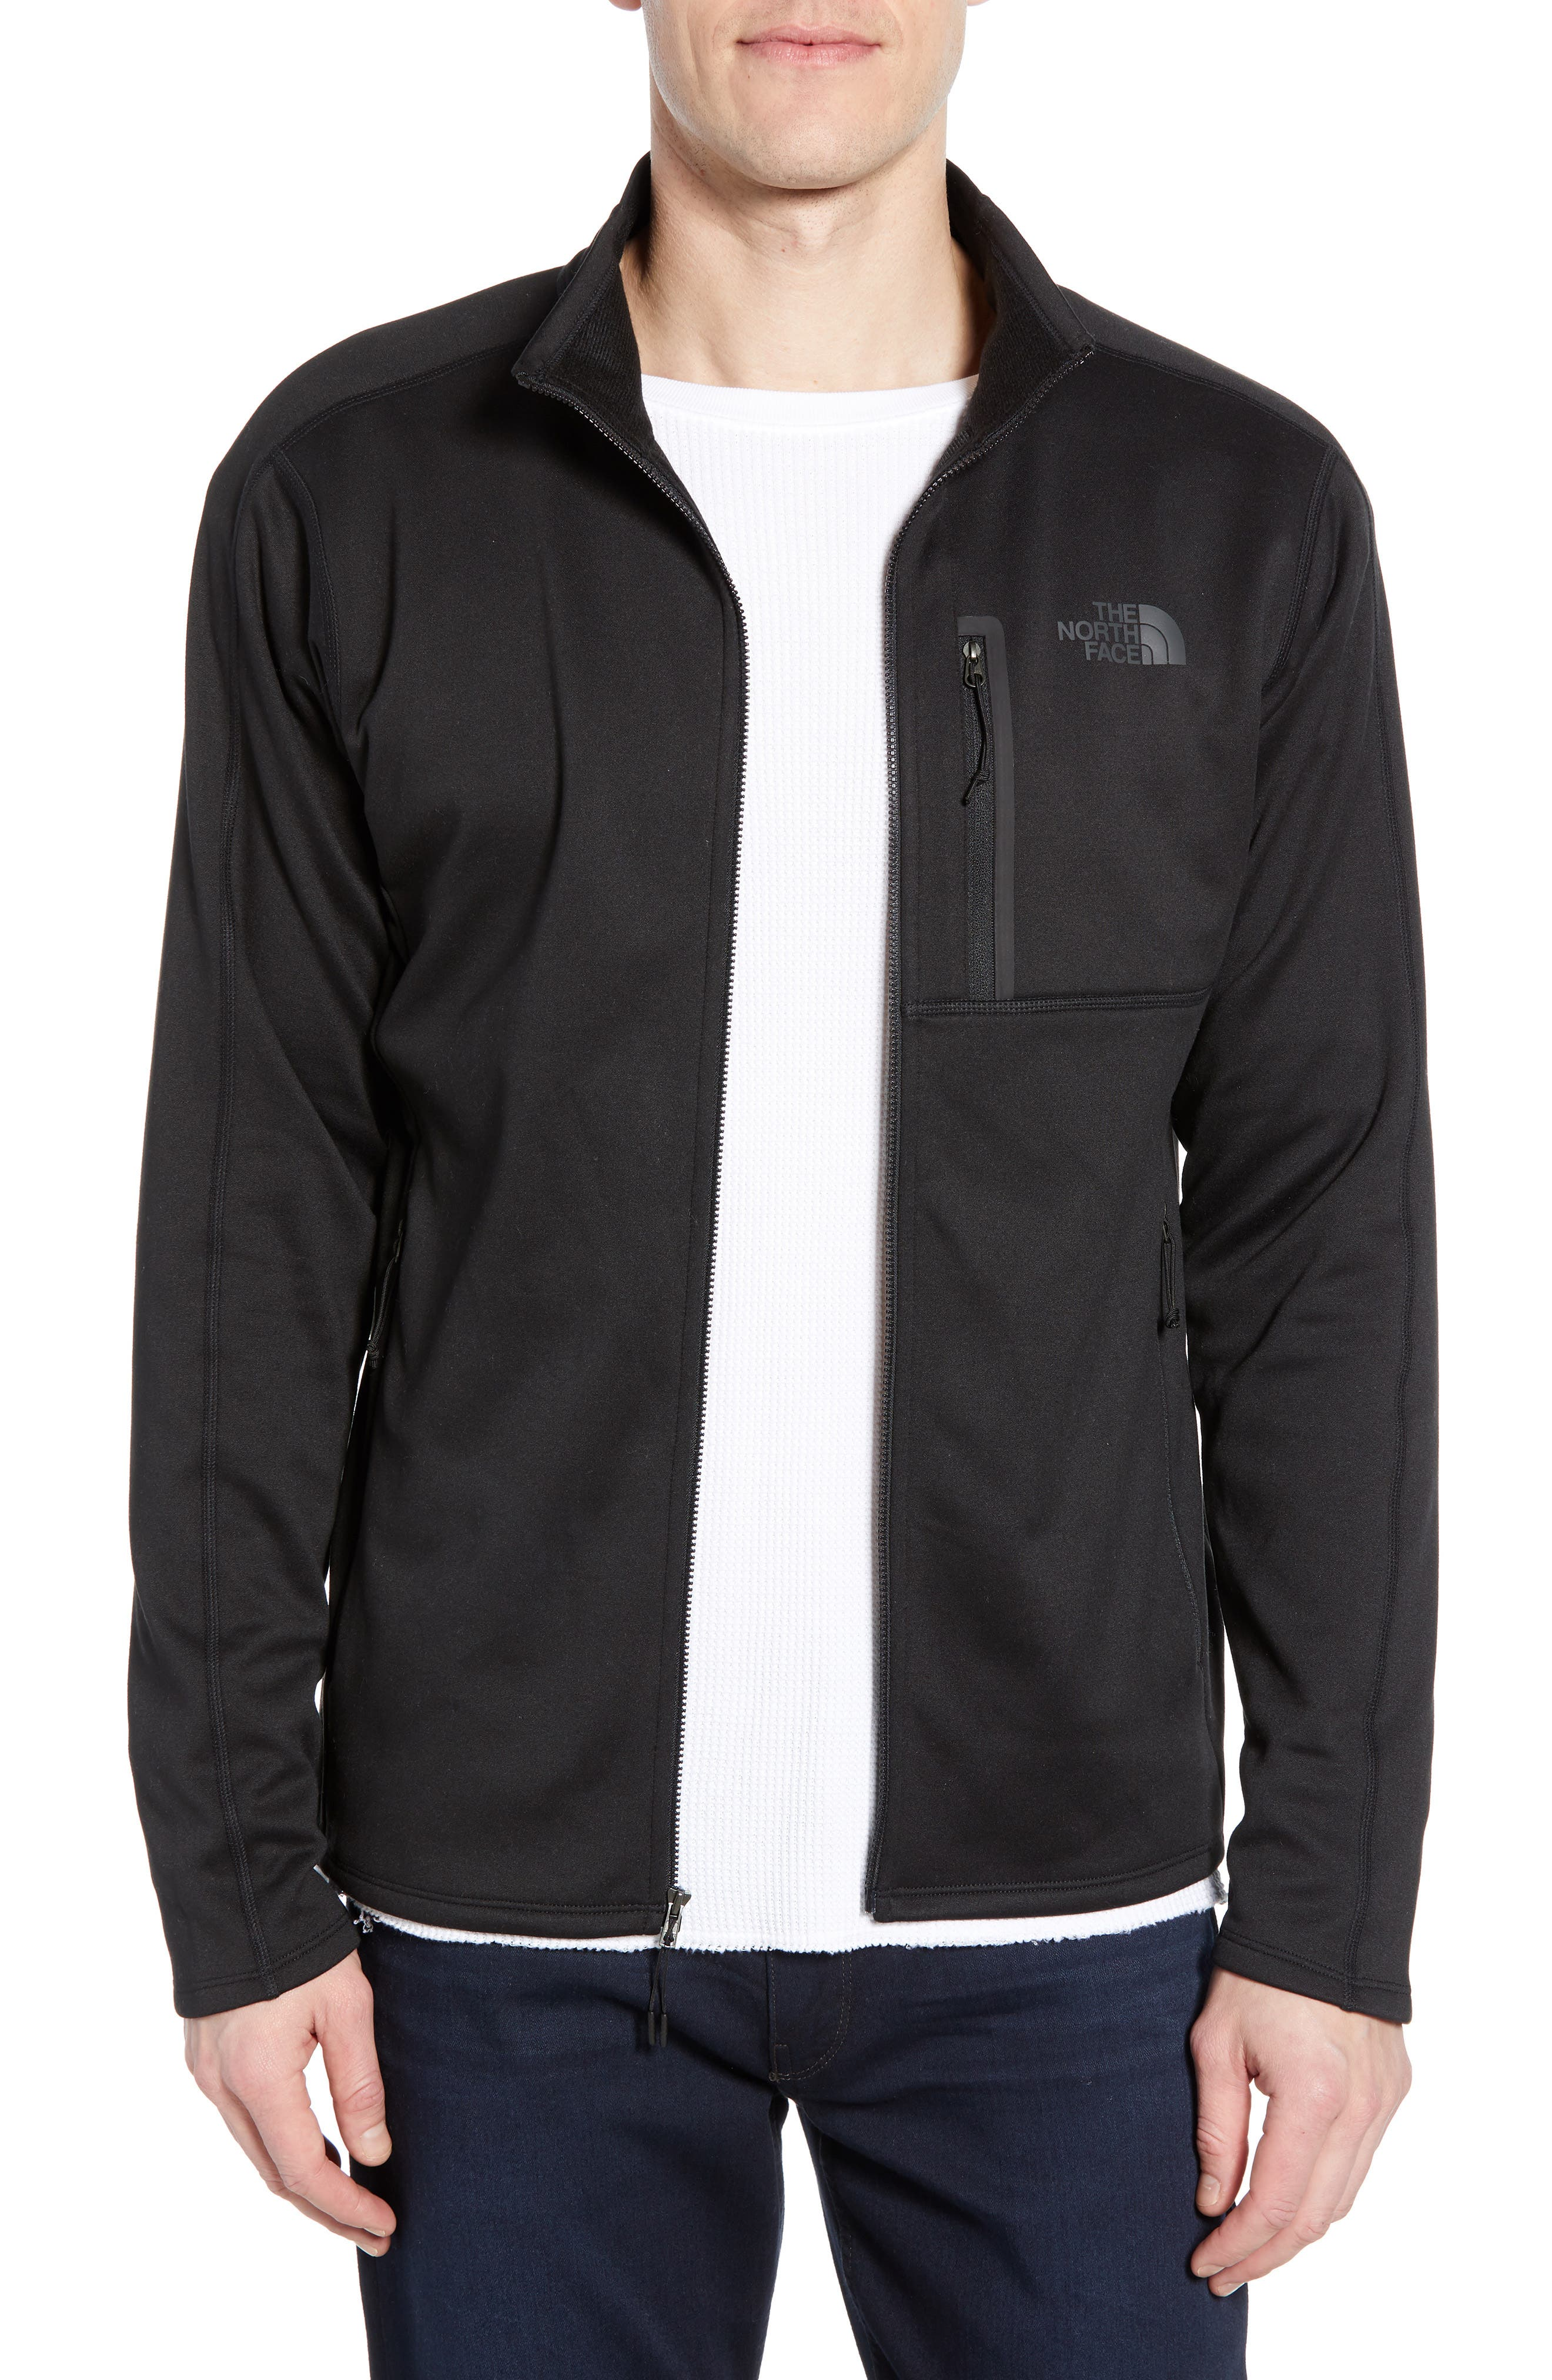 THE NORTH FACE Canyonlands Zip Jacket, Main, color, TNF BLACK